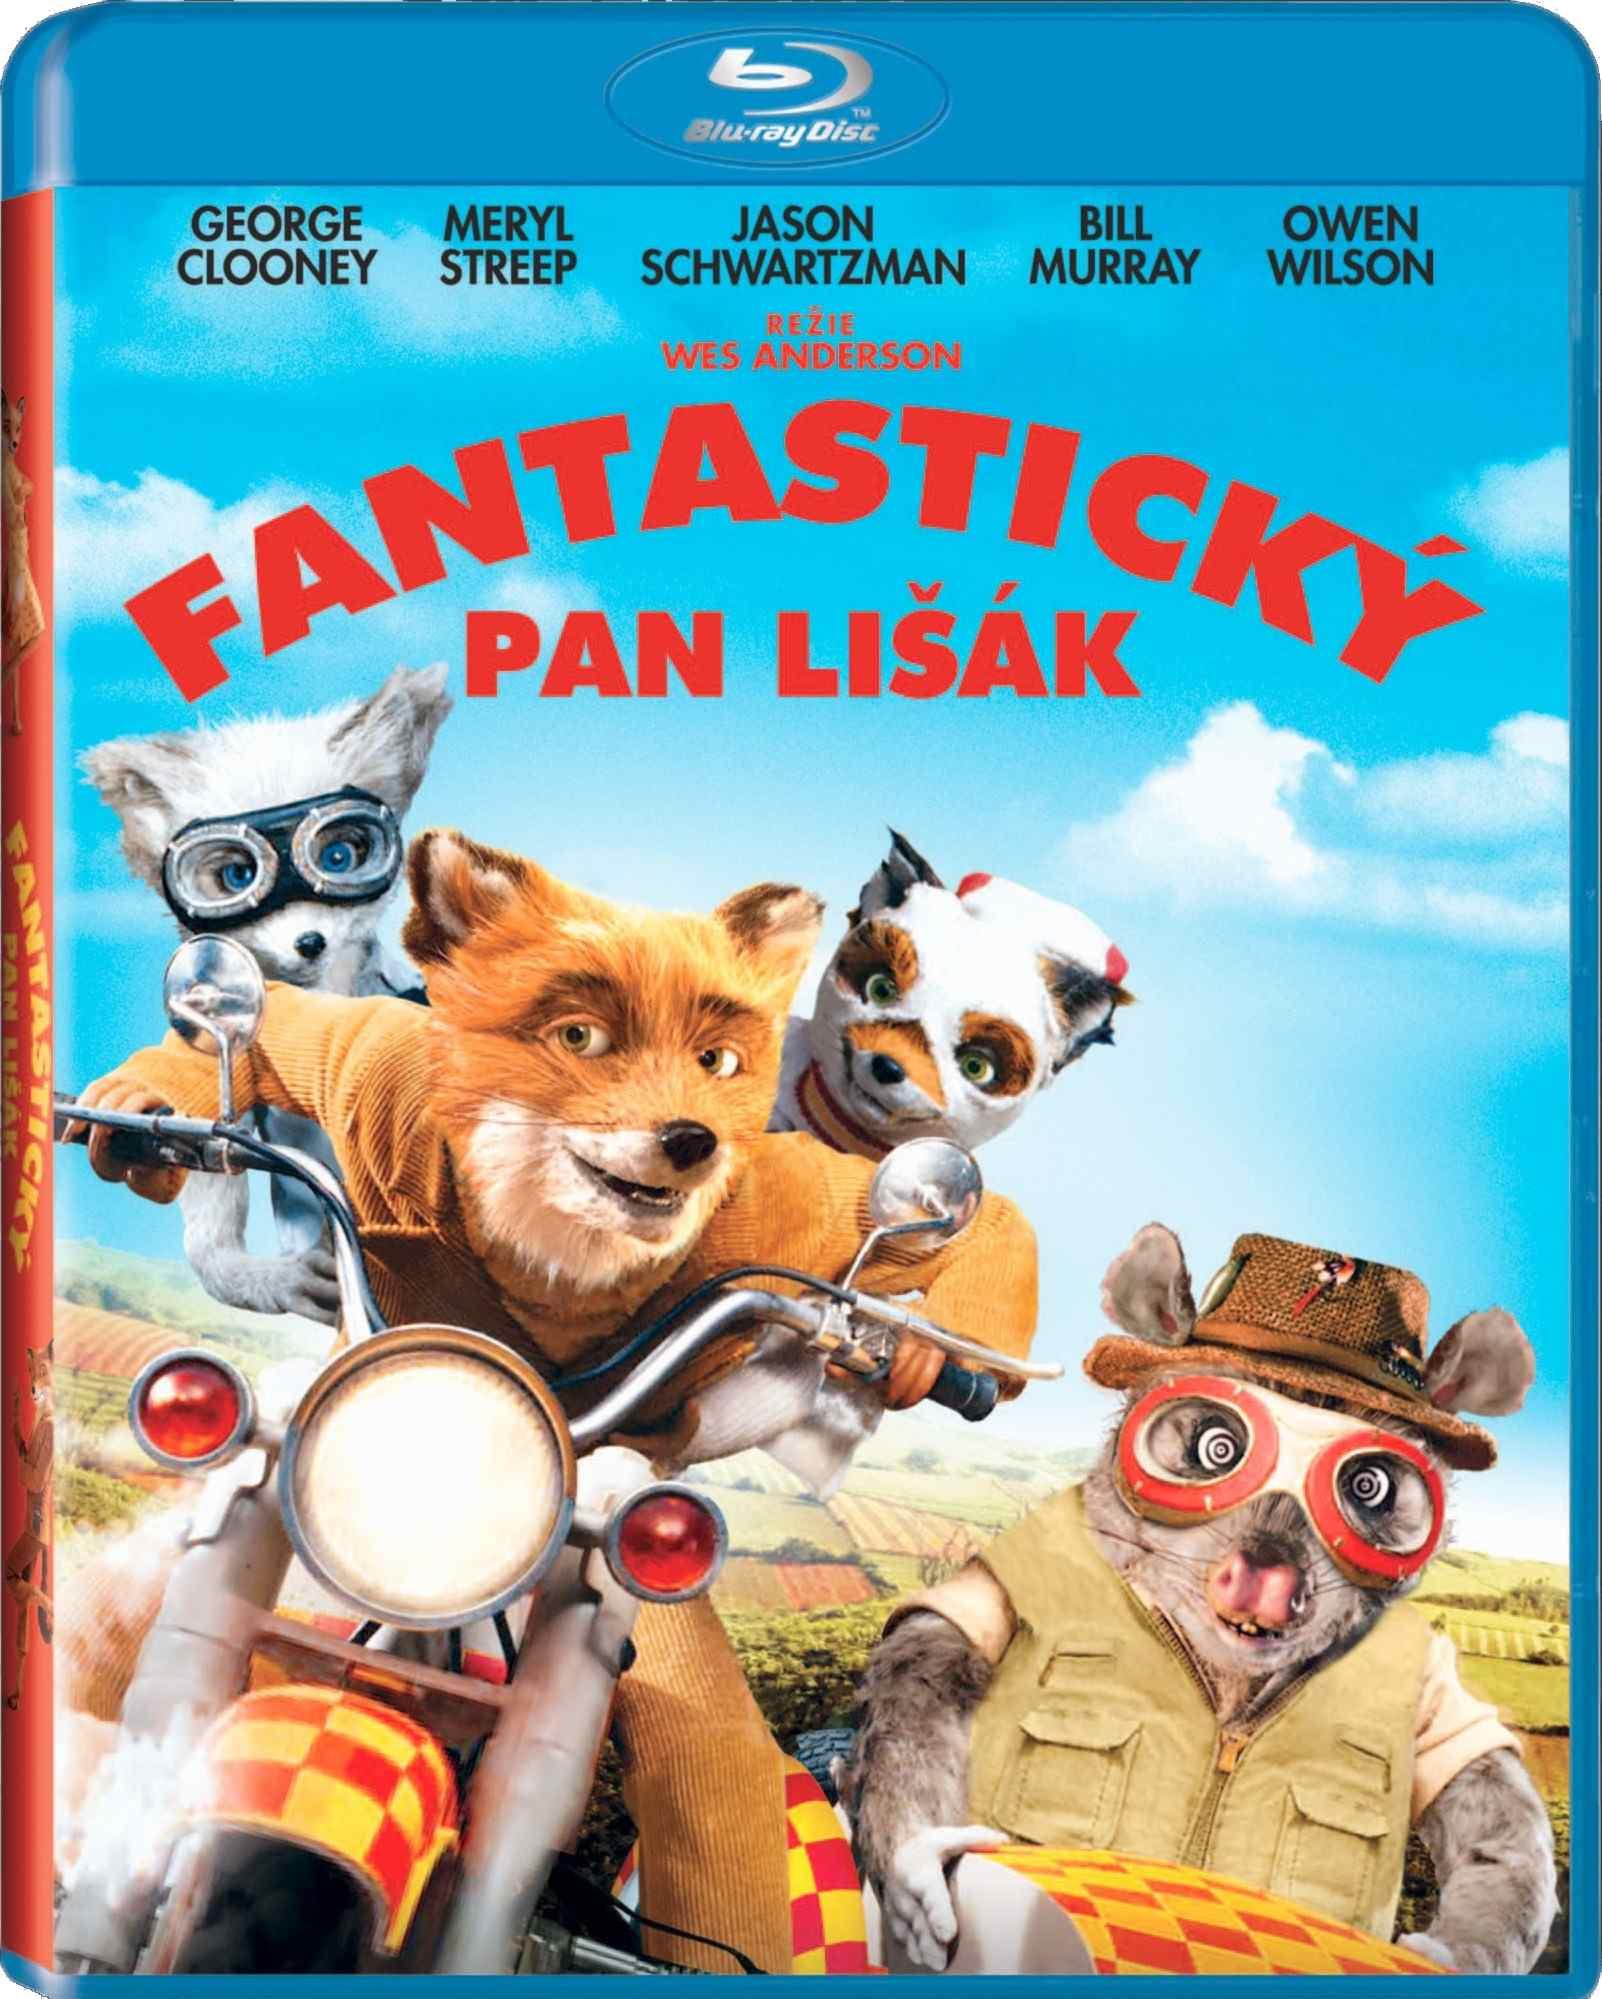 FANTASTICKÝ PAN LIŠÁK - Blu-ray (AKCE FOX)